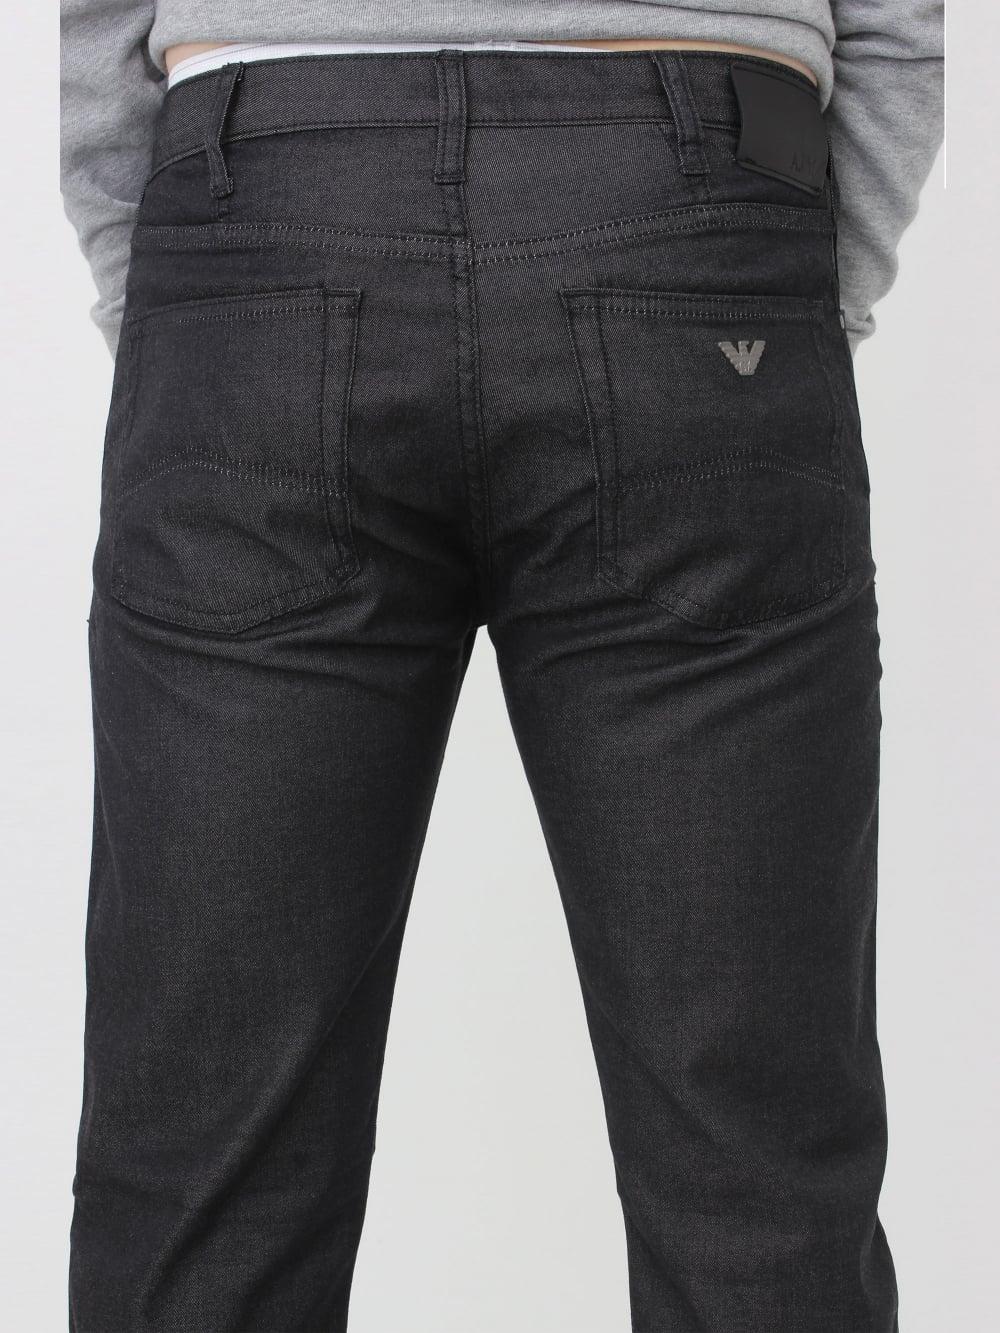 sports shoes 9876d cd88e J21 Regular Fit Jeans - Black